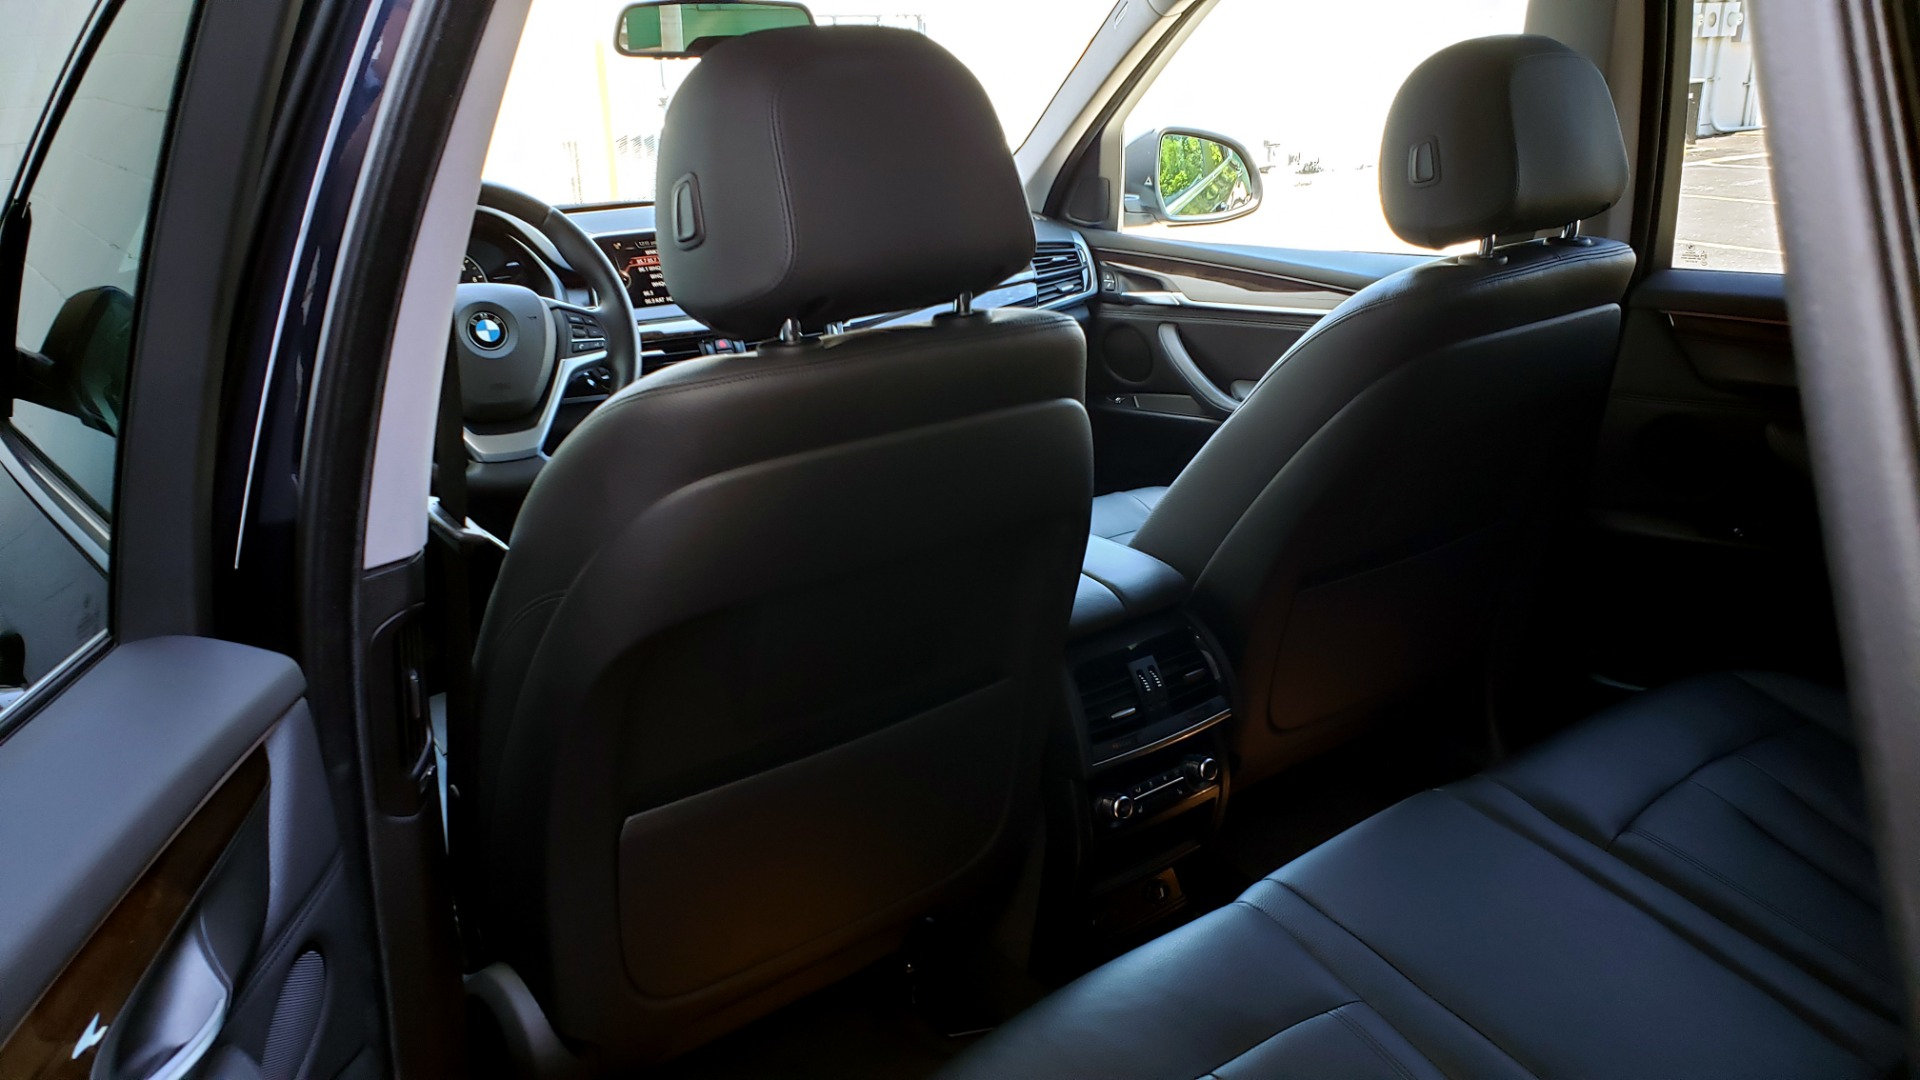 Used 2016 BMW X5 XDRIVE35I / PREM PKG / NAV / DRVR ASST PLUS / REARVIEW for sale $25,765 at Formula Imports in Charlotte NC 28227 44